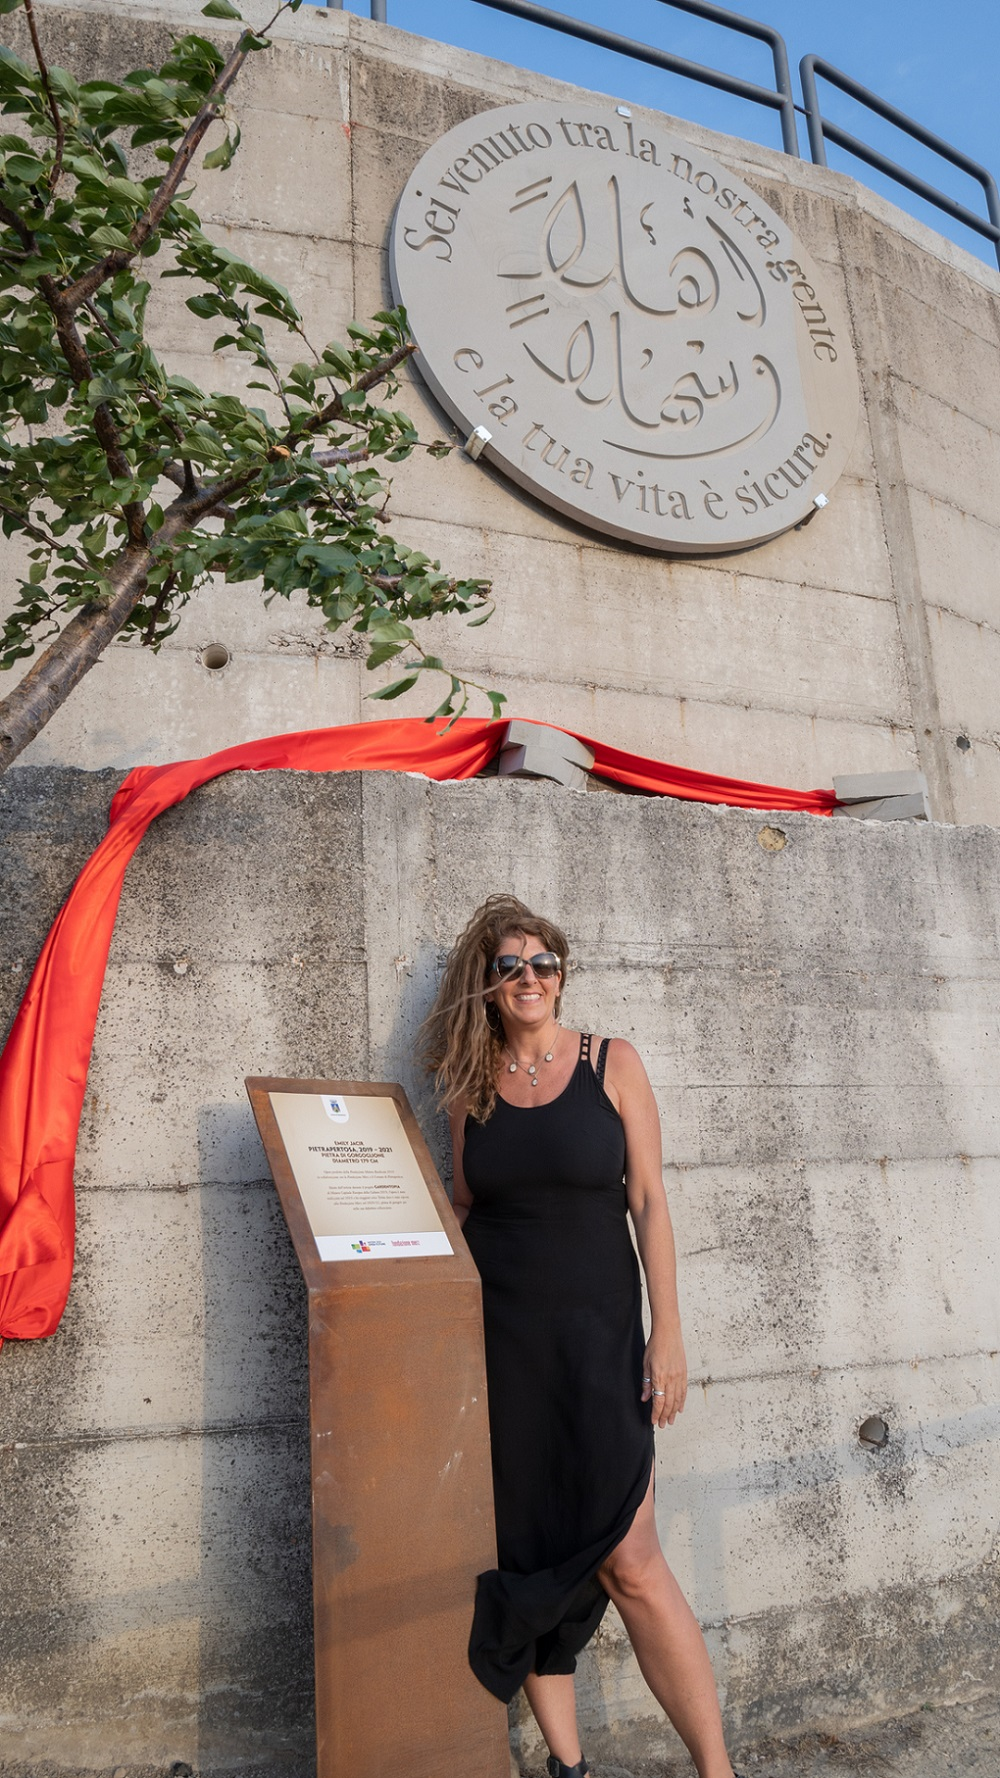 Matera 2019, a Pietrapertosa l'opera dell'artista Emily Jacir